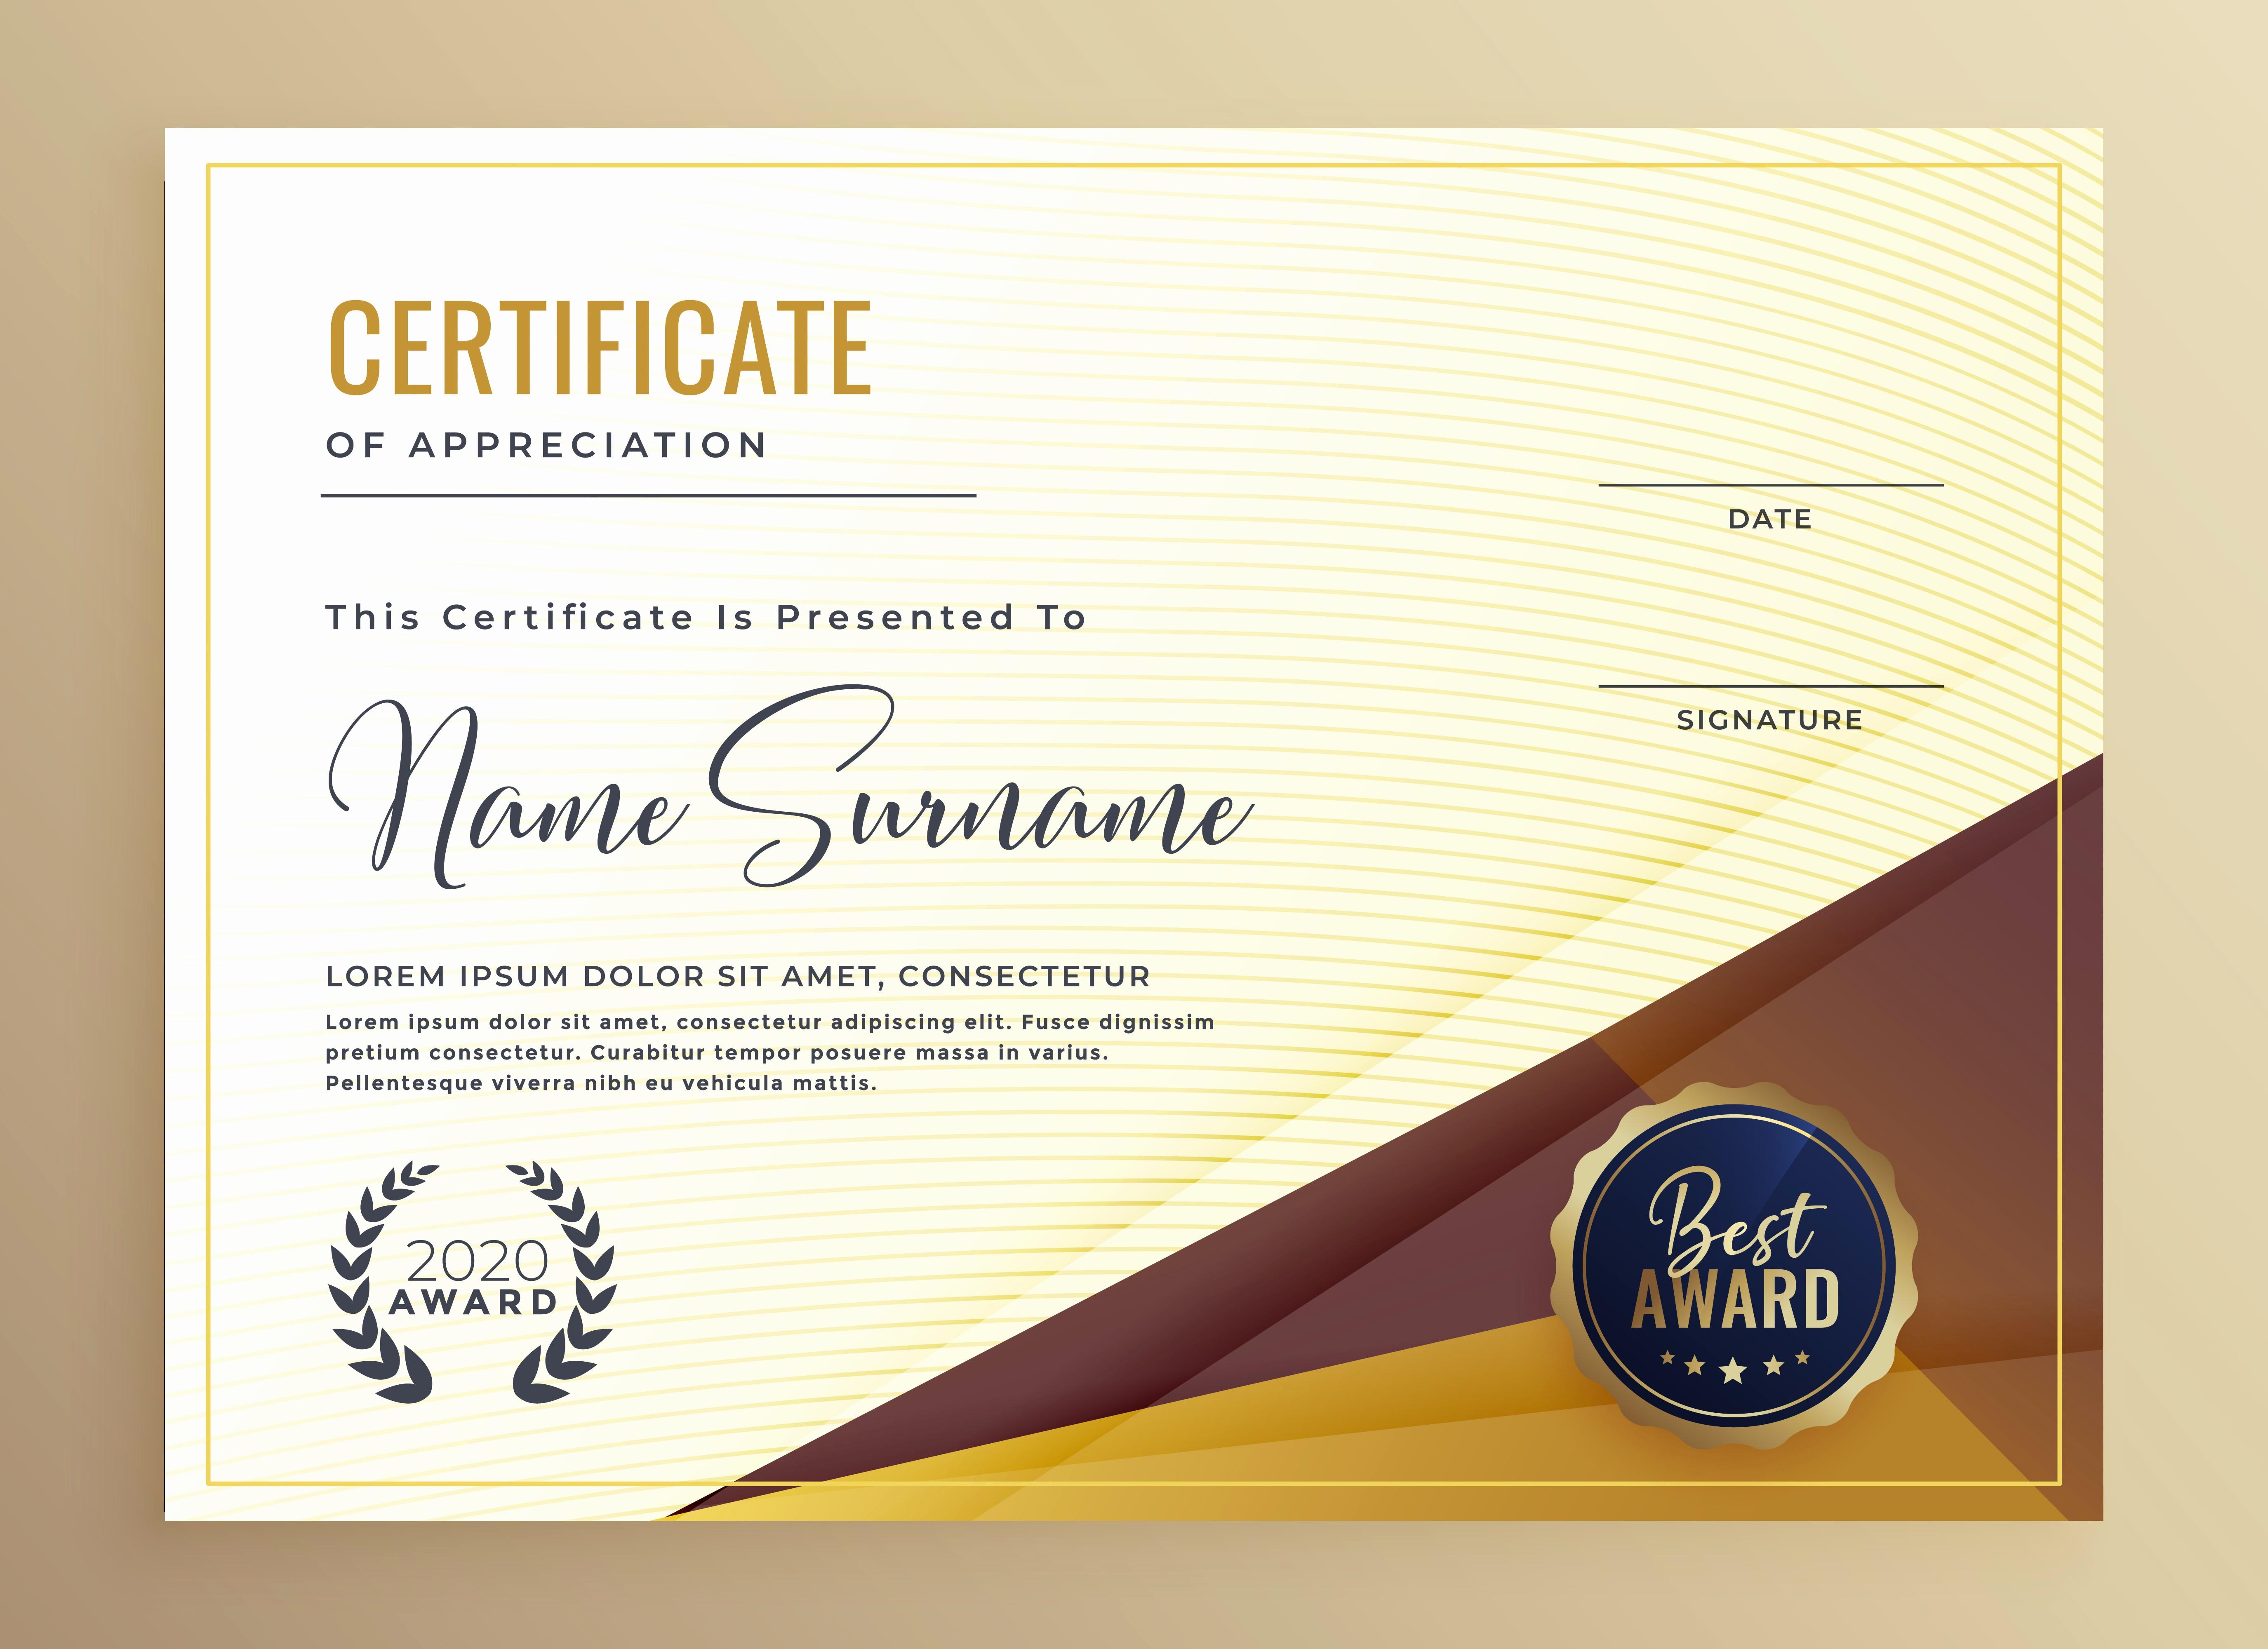 Certificate Background Design Free Download Beautiful Luxury Premium Certificate Design Template Download Free